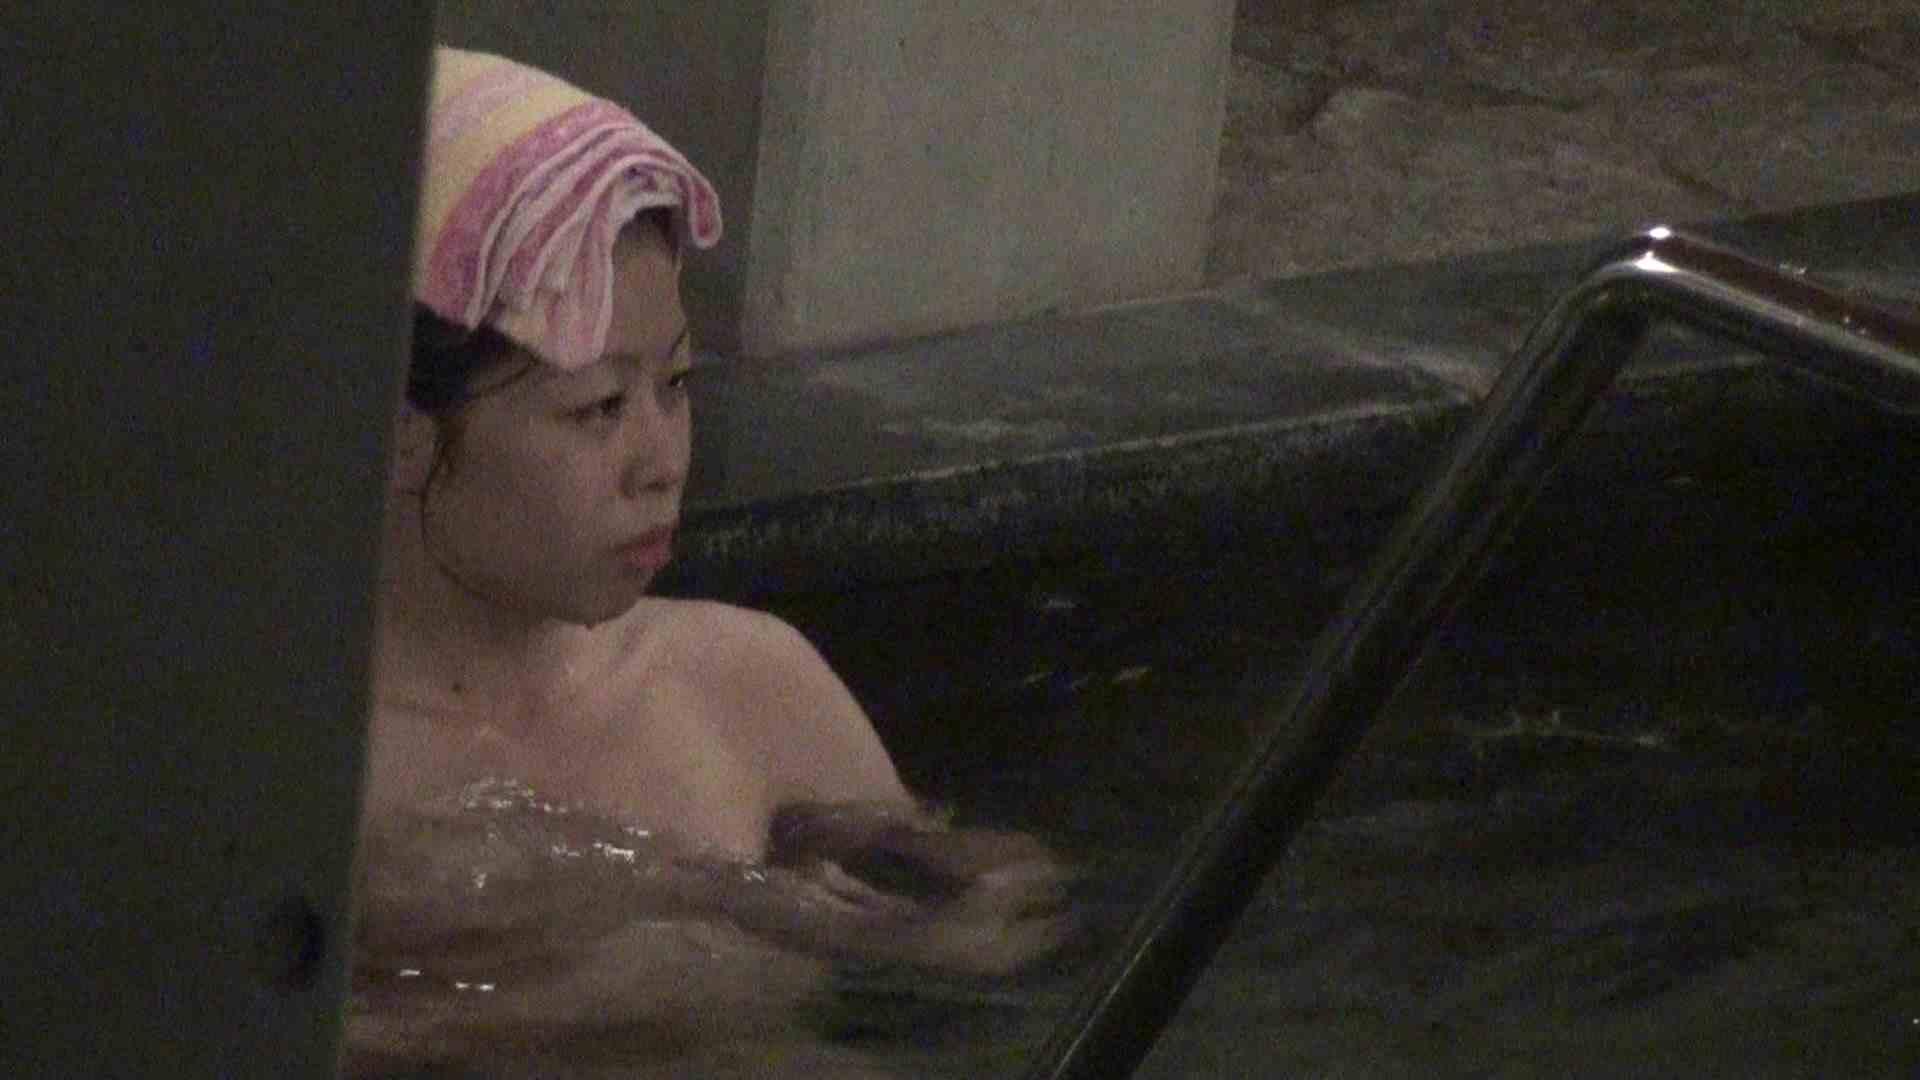 Aquaな露天風呂Vol.324 露天 | HなOL  102pic 74